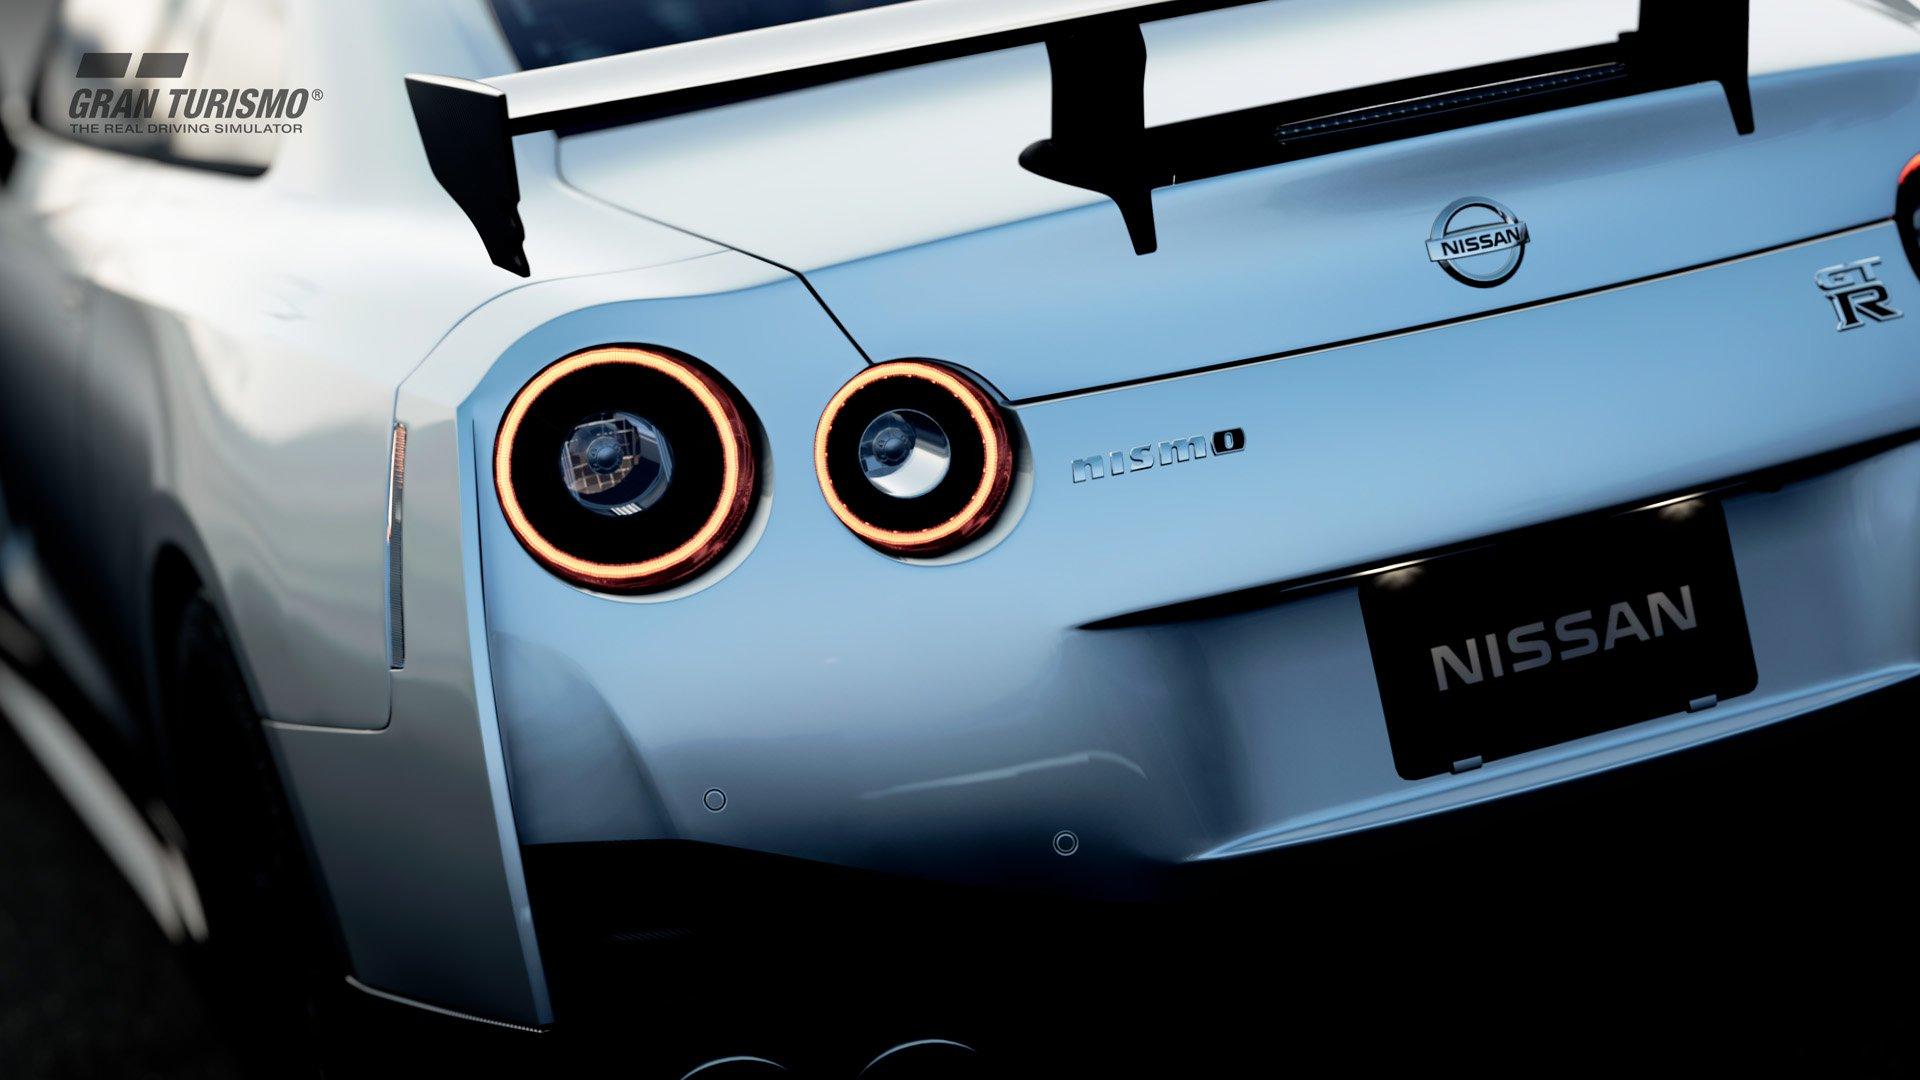 Gran Turismo Sport version 1.15 Nissan GT-R NISMO '17 (N600) 1